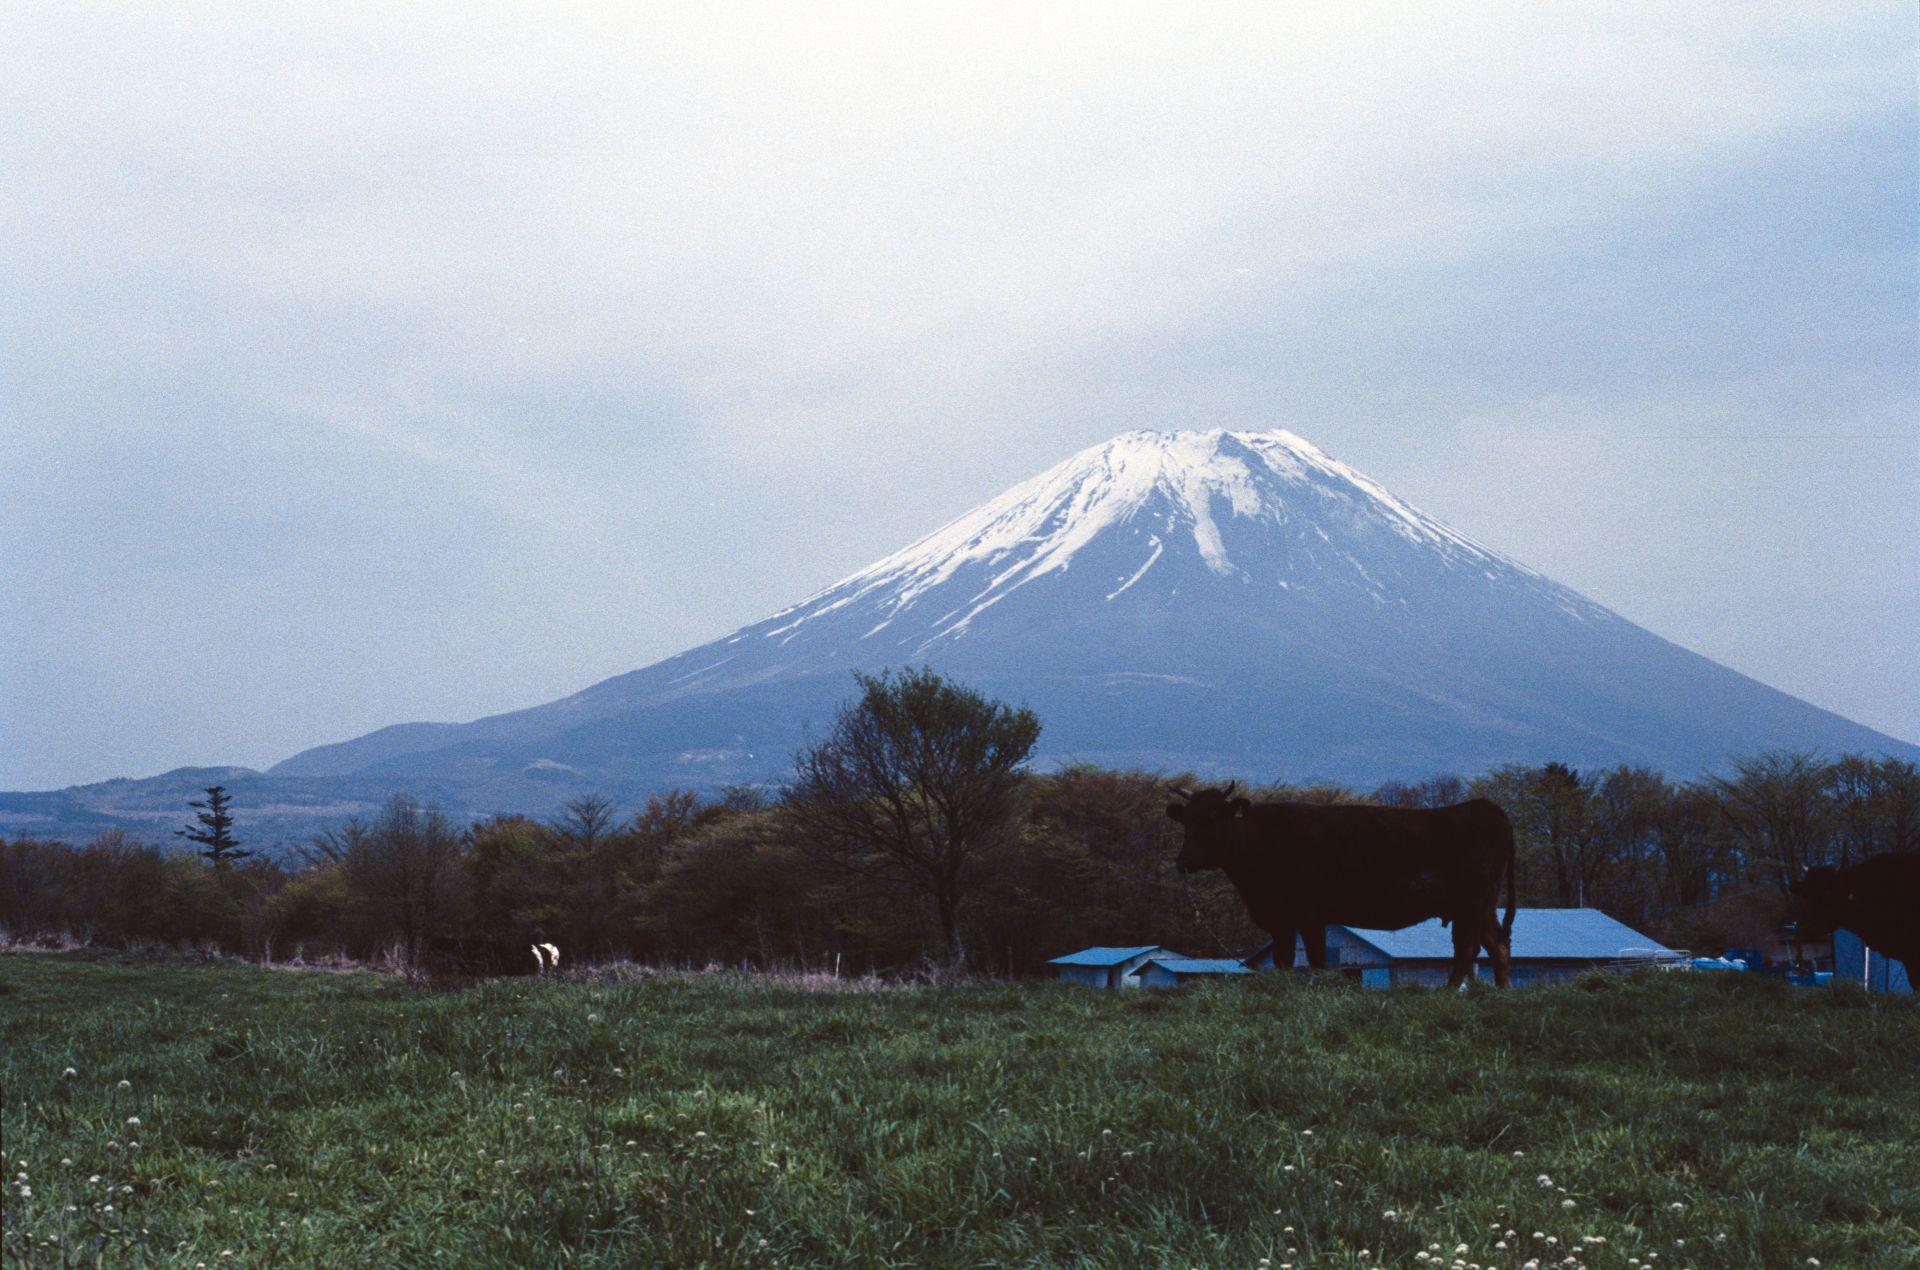 f:id:yasuo_ssi:20201016003503j:plain